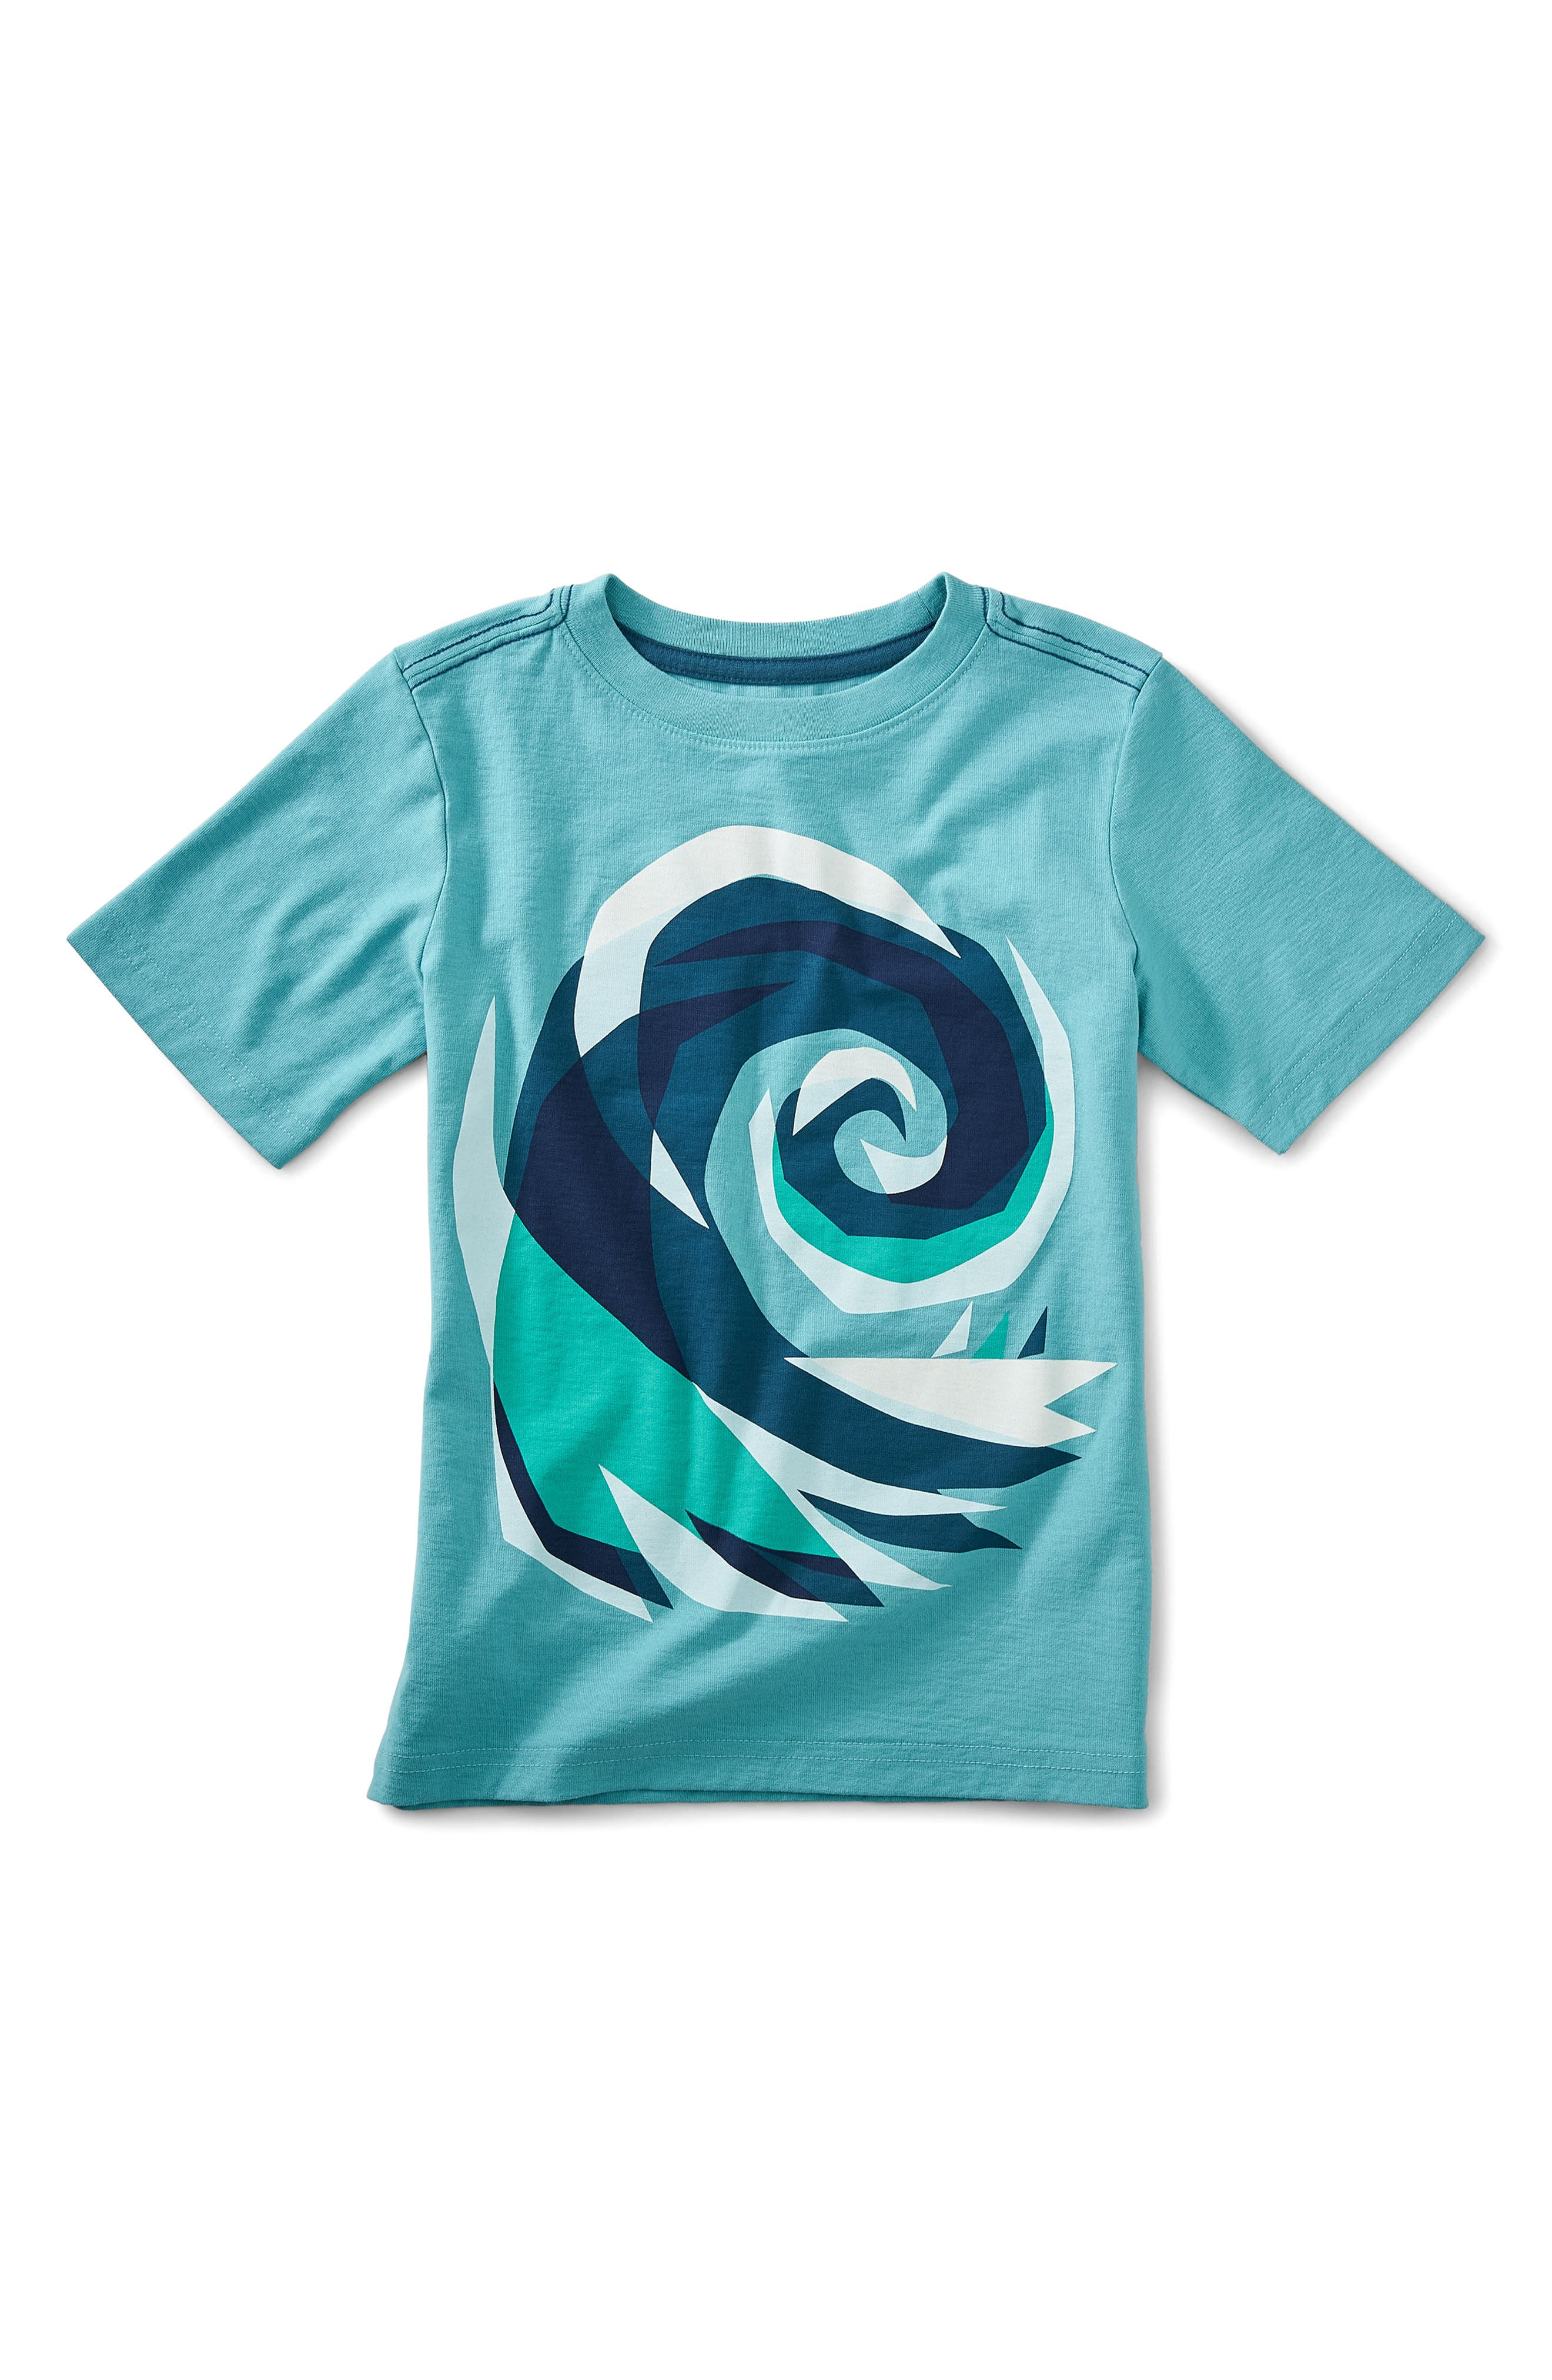 Crashing Wave Graphic T-Shirt,                         Main,                         color, Ciel